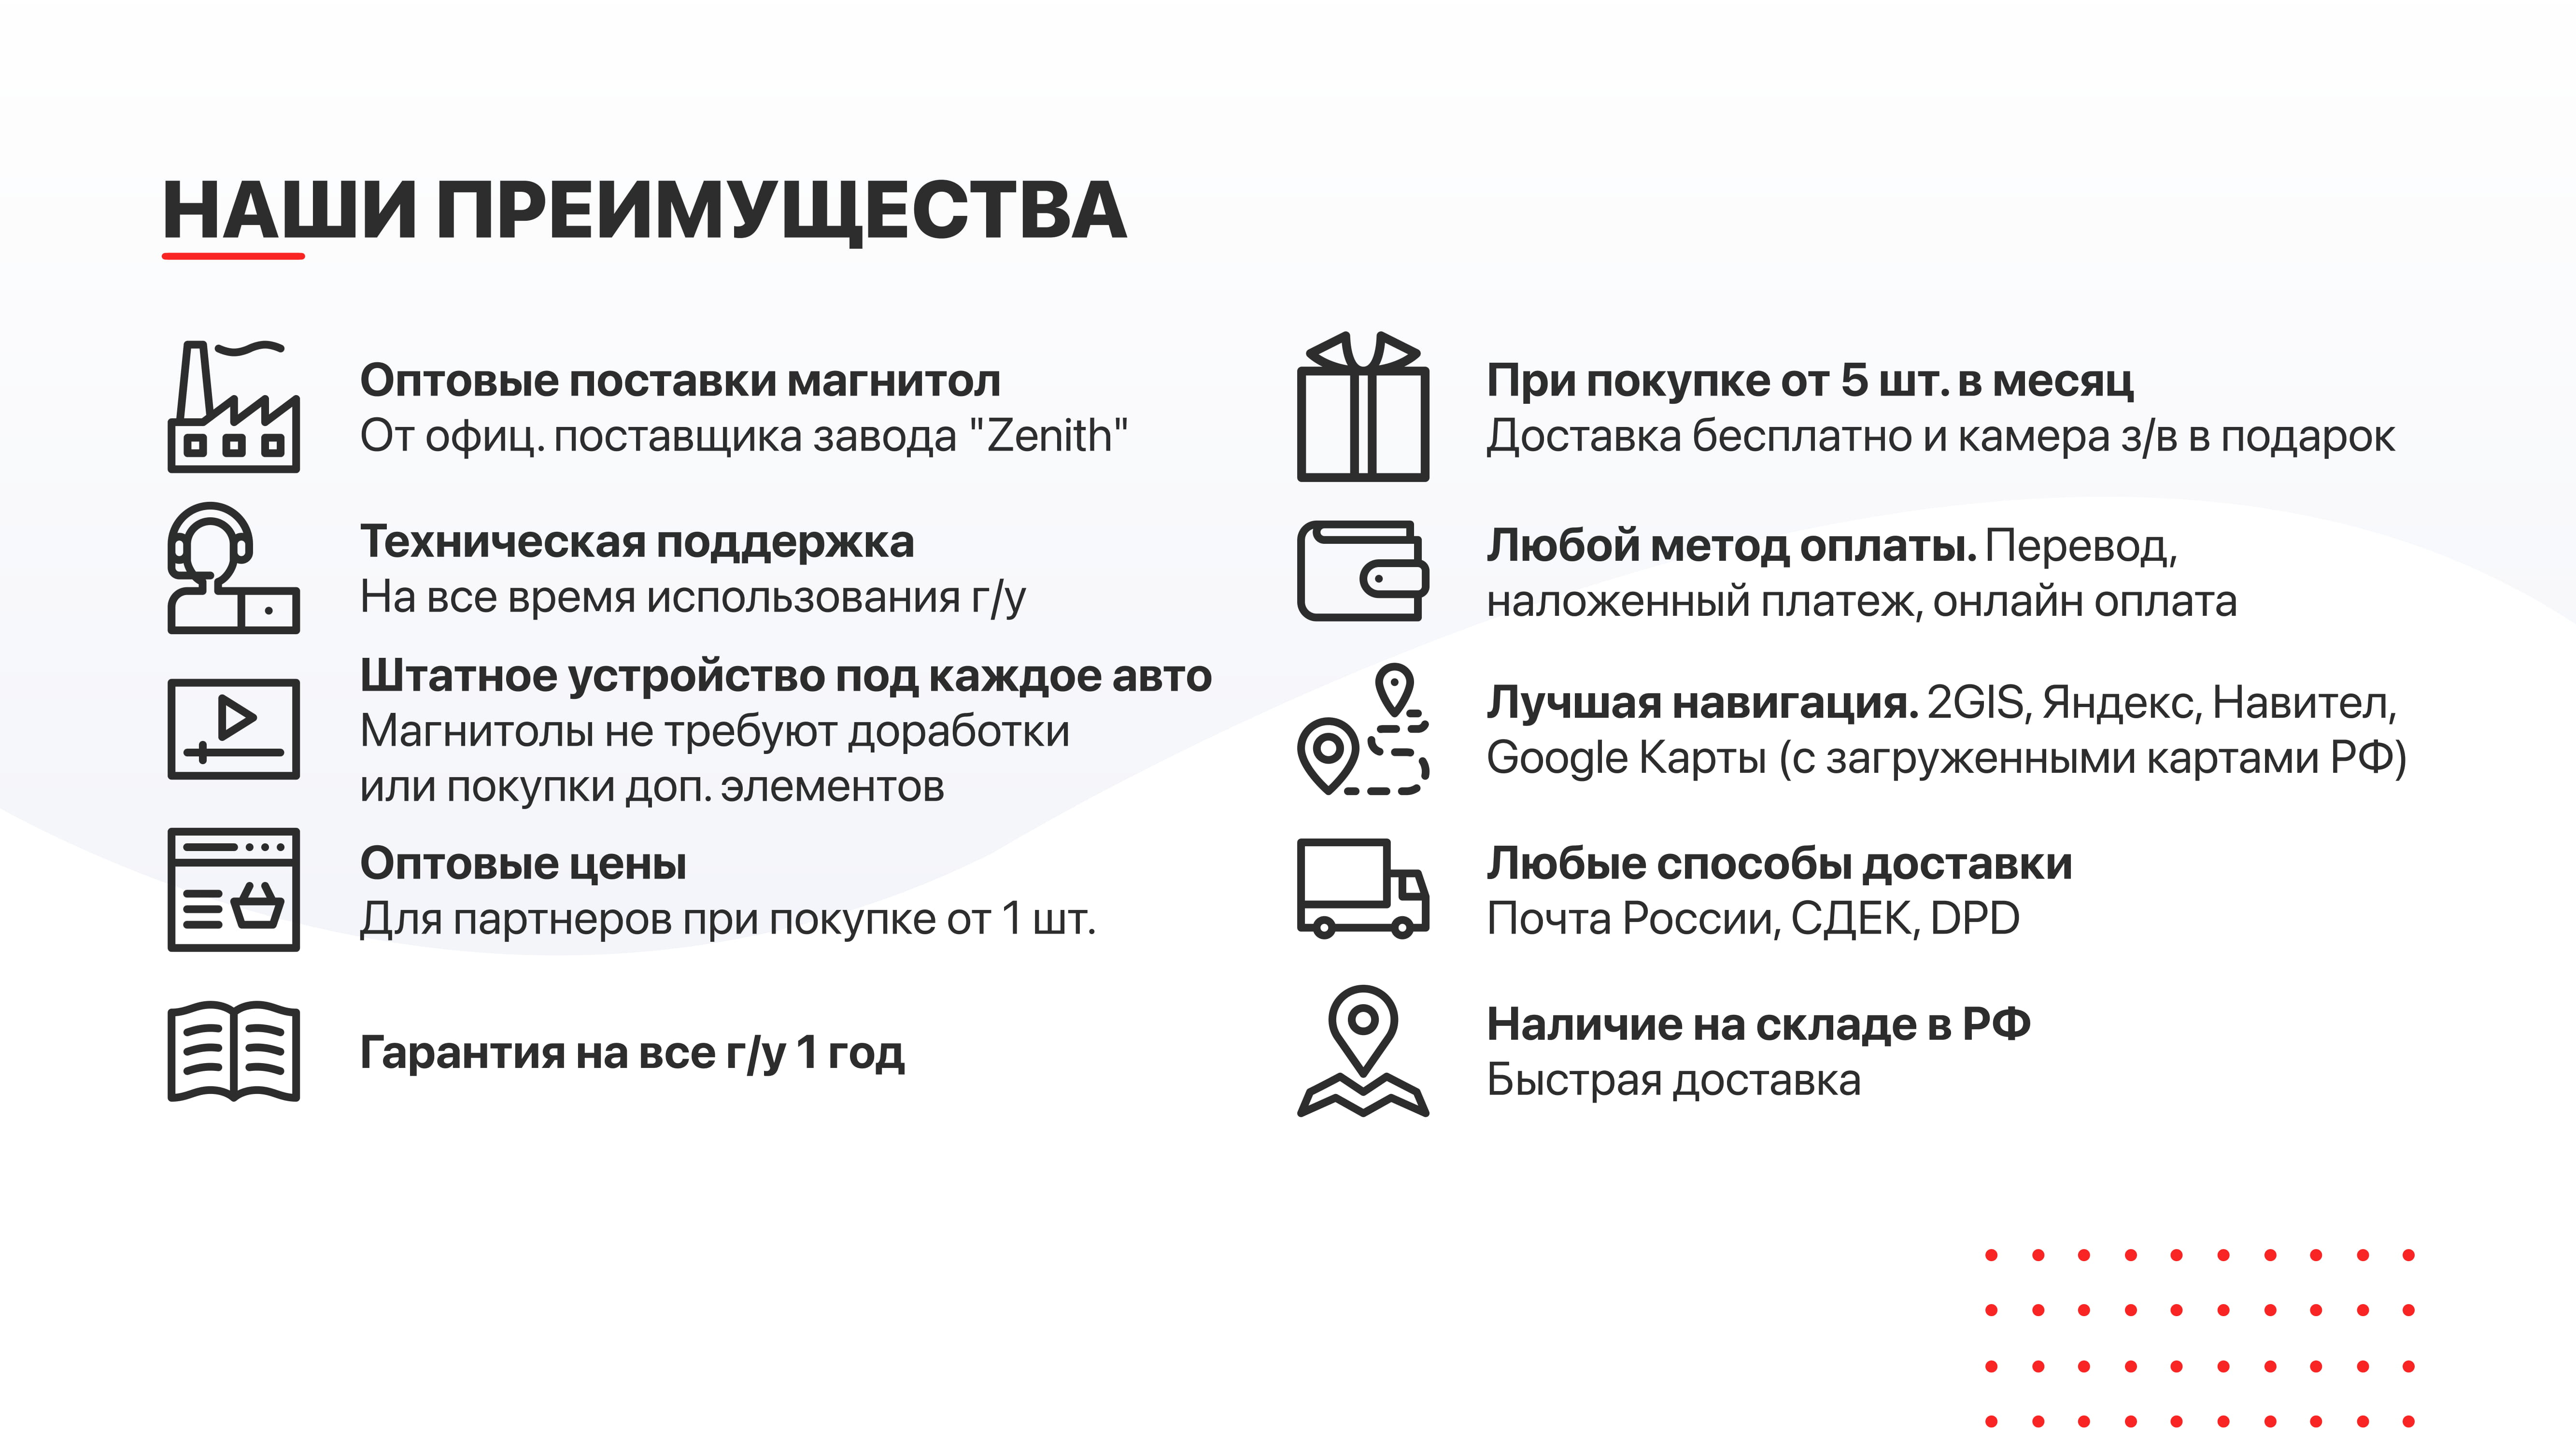 https://audiostart.ru/images/upload/Audio%20Start%20Presentation%20Print-03.jpg